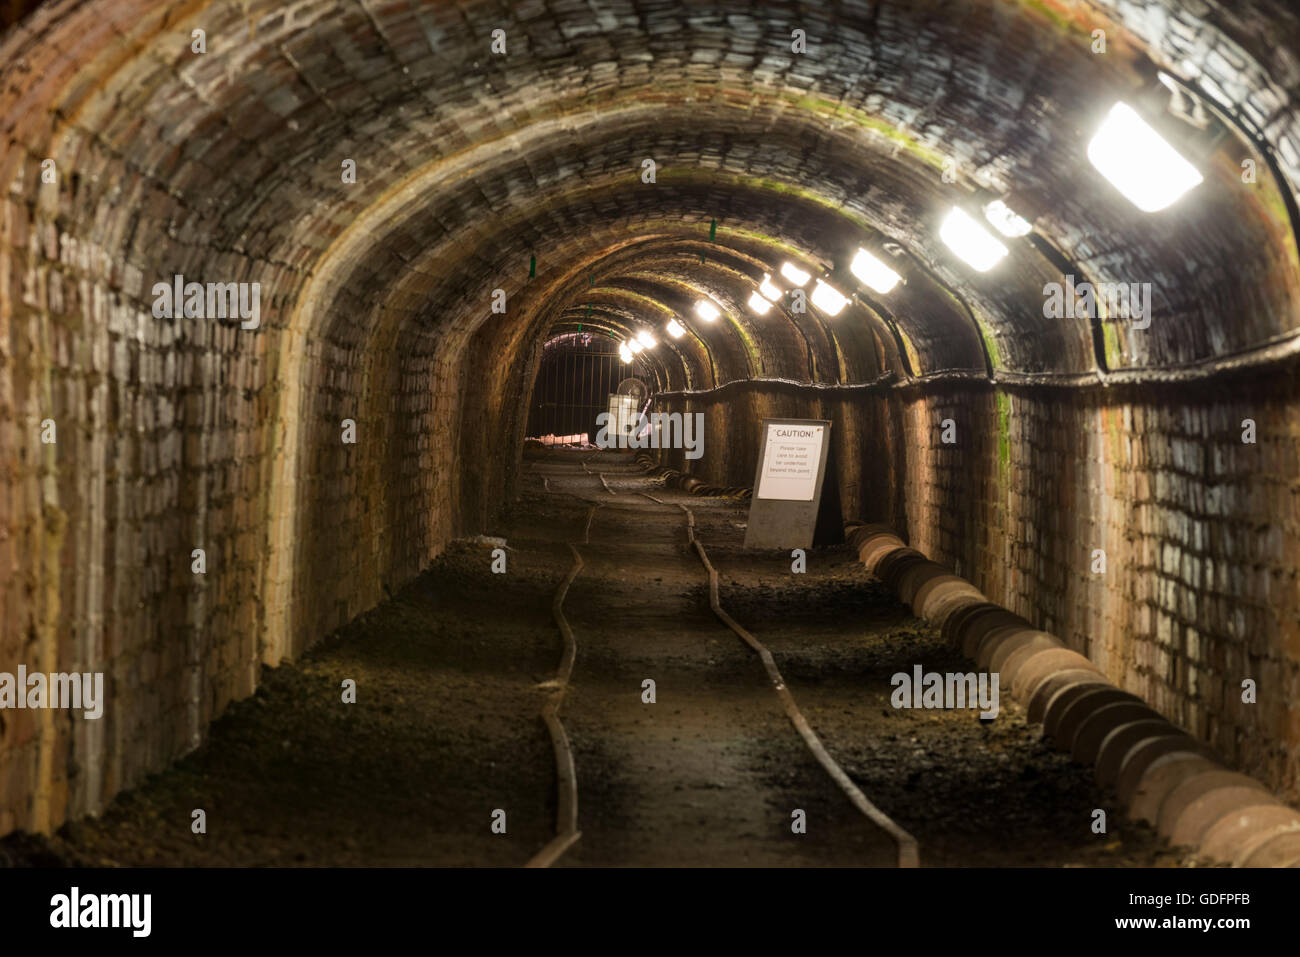 The Tar Tunnel at Coalport, Ironbridge Gorge, Shropshire, England, UK. - Stock Image